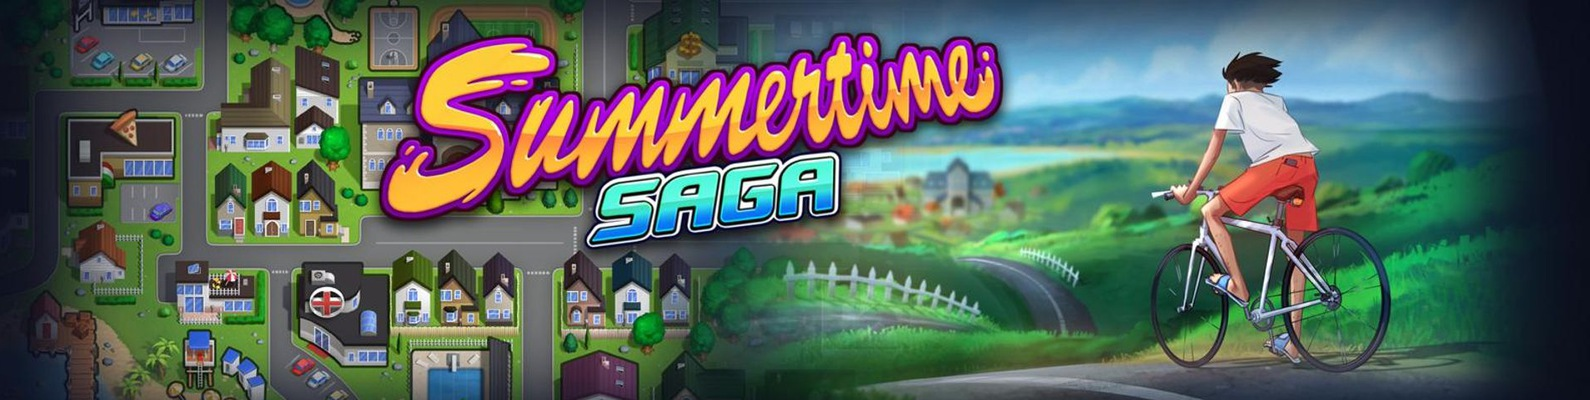 Summertime Saga Download Pc Free - Apkfreeze